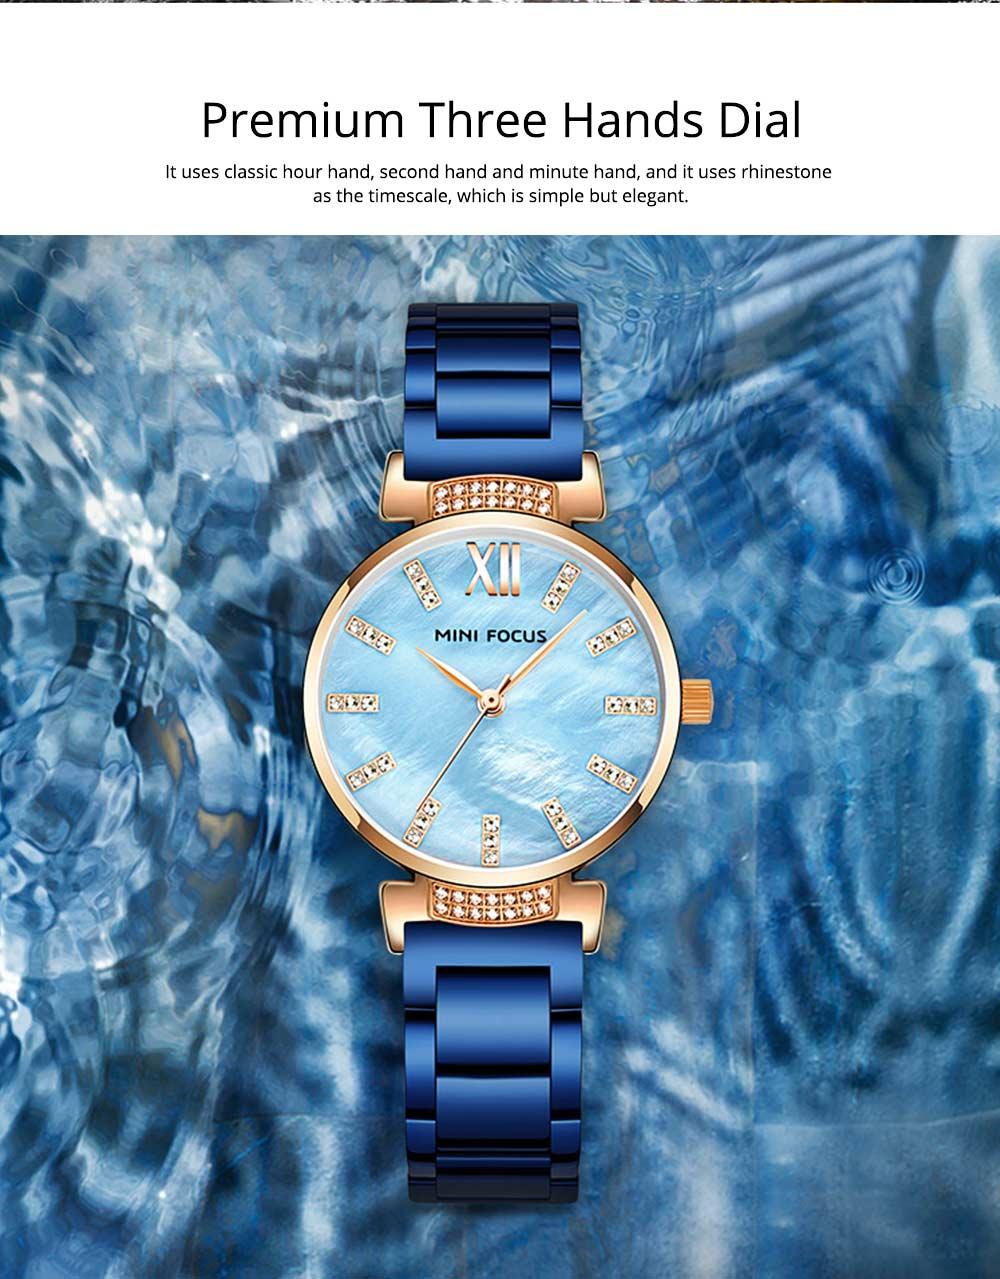 Diamond-mounted Fritillaria Watch for Women, Girls, Stylish Watch with Stainless Steel Watchband Waterproof 30M Wristwatch 2